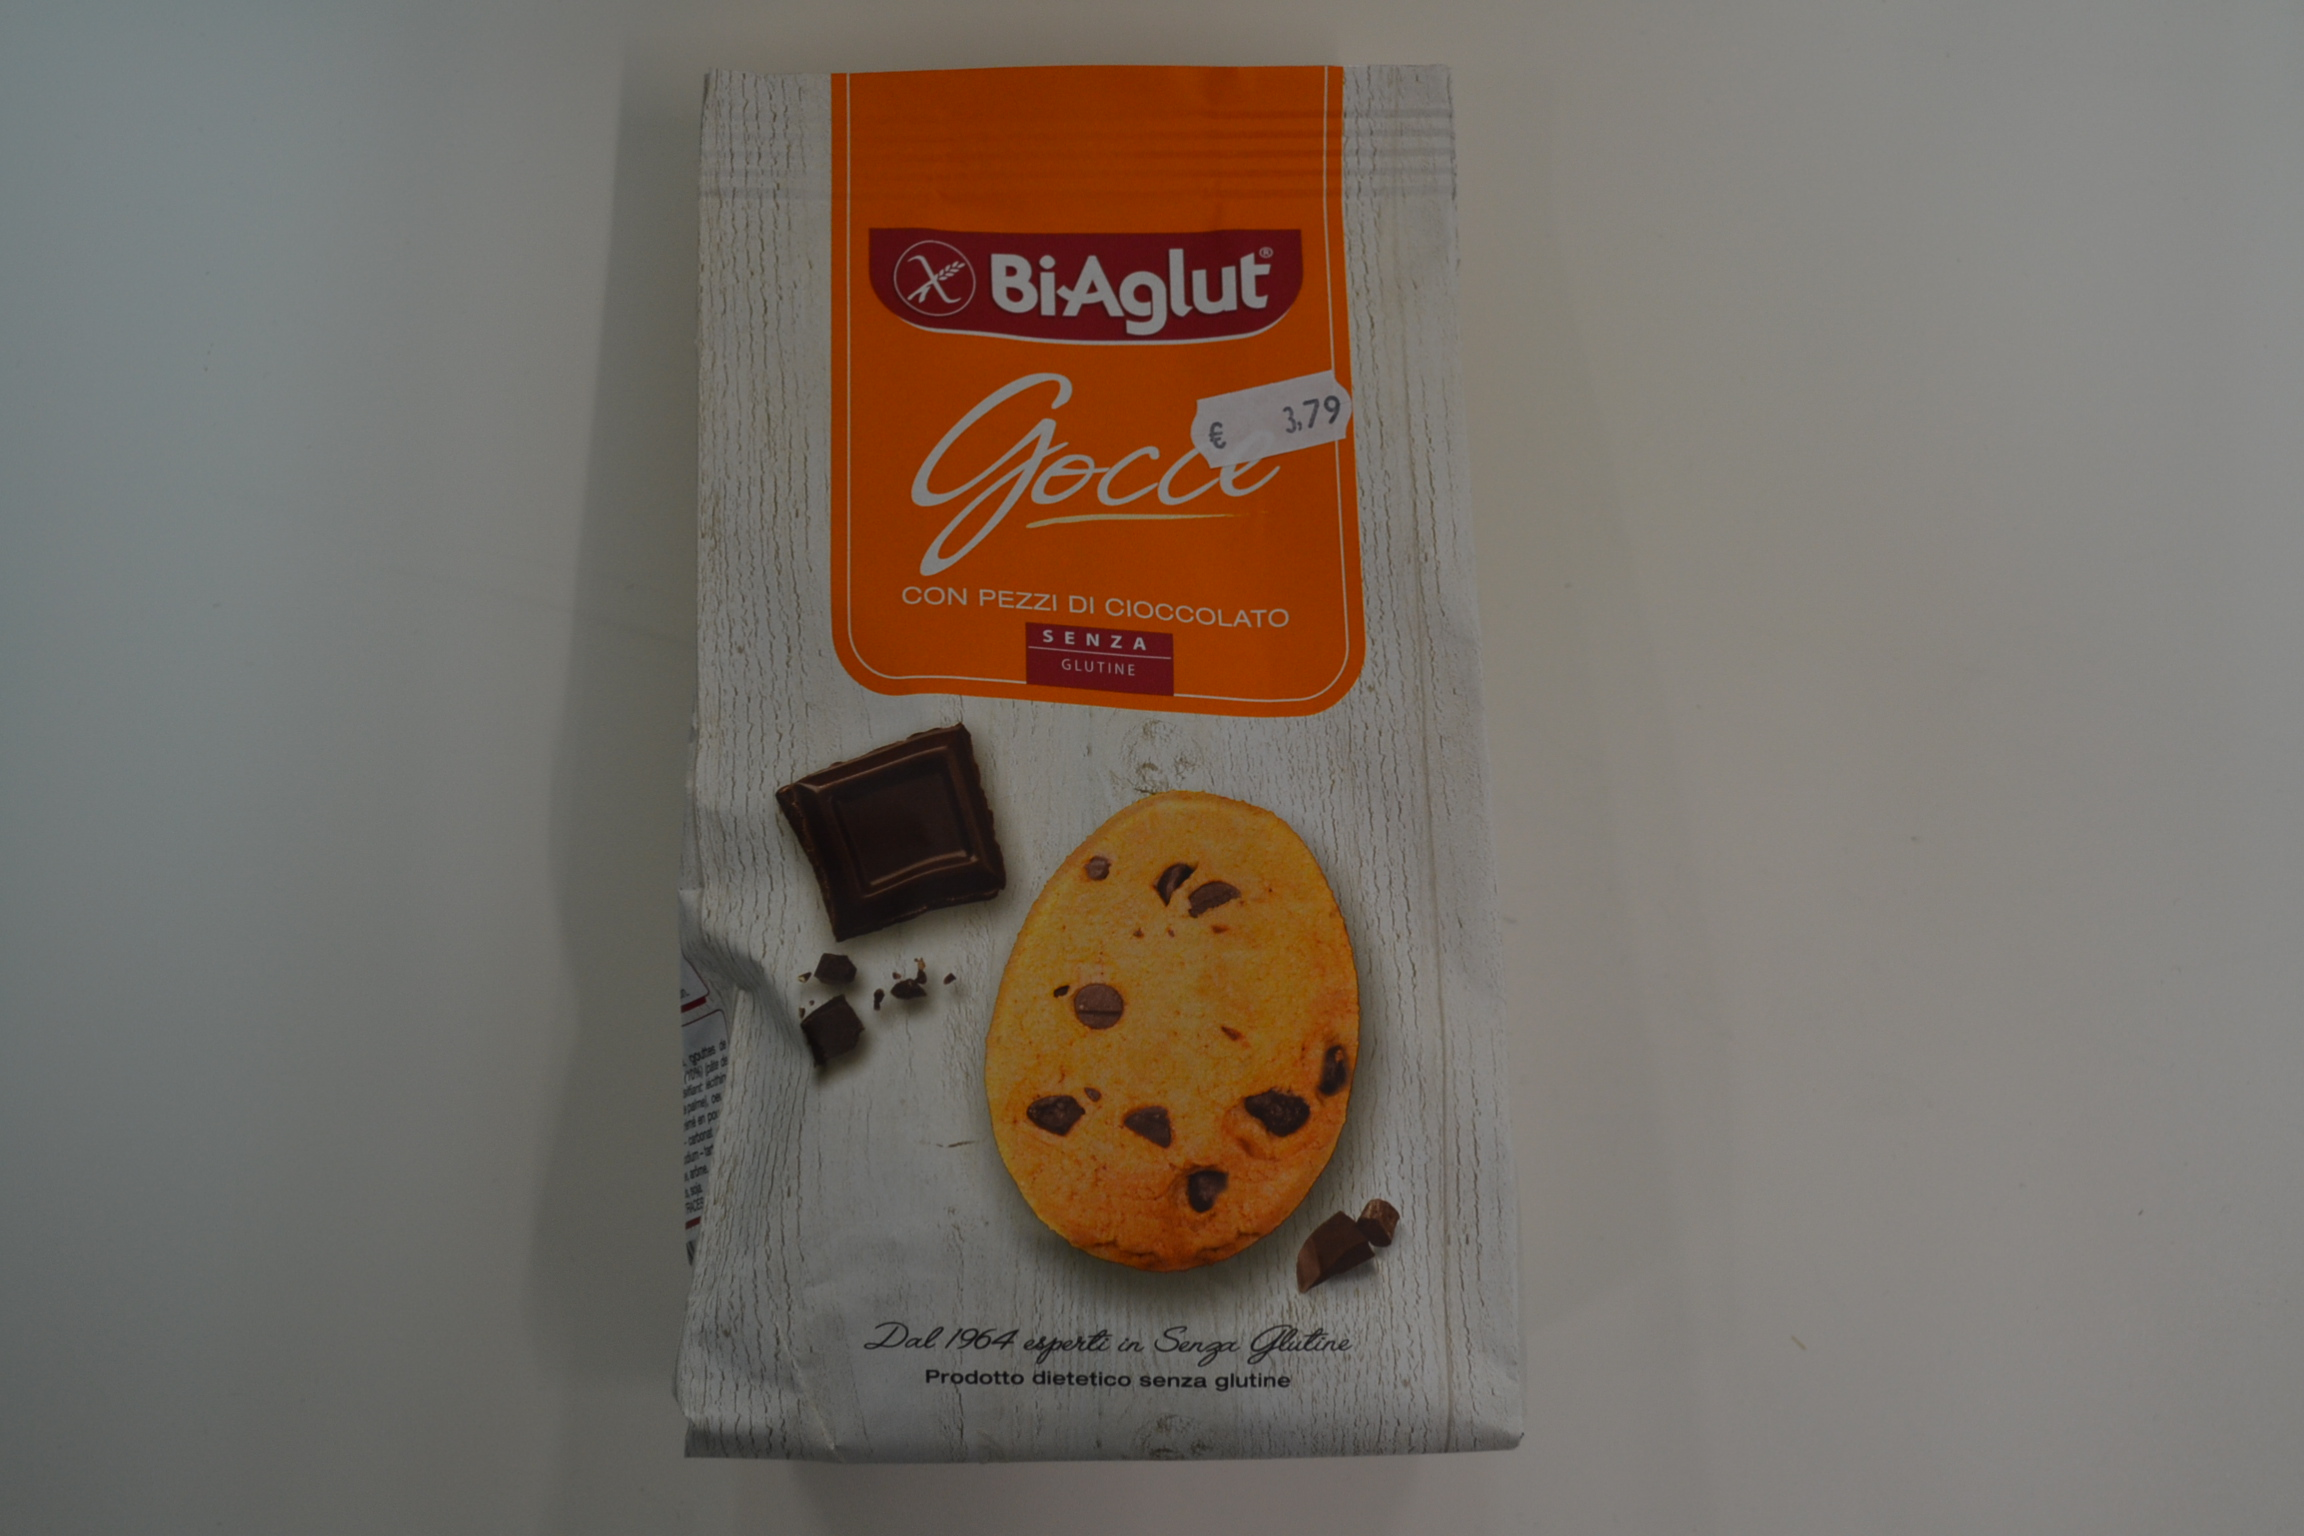 Gocce al cioccolato BIAGLUT